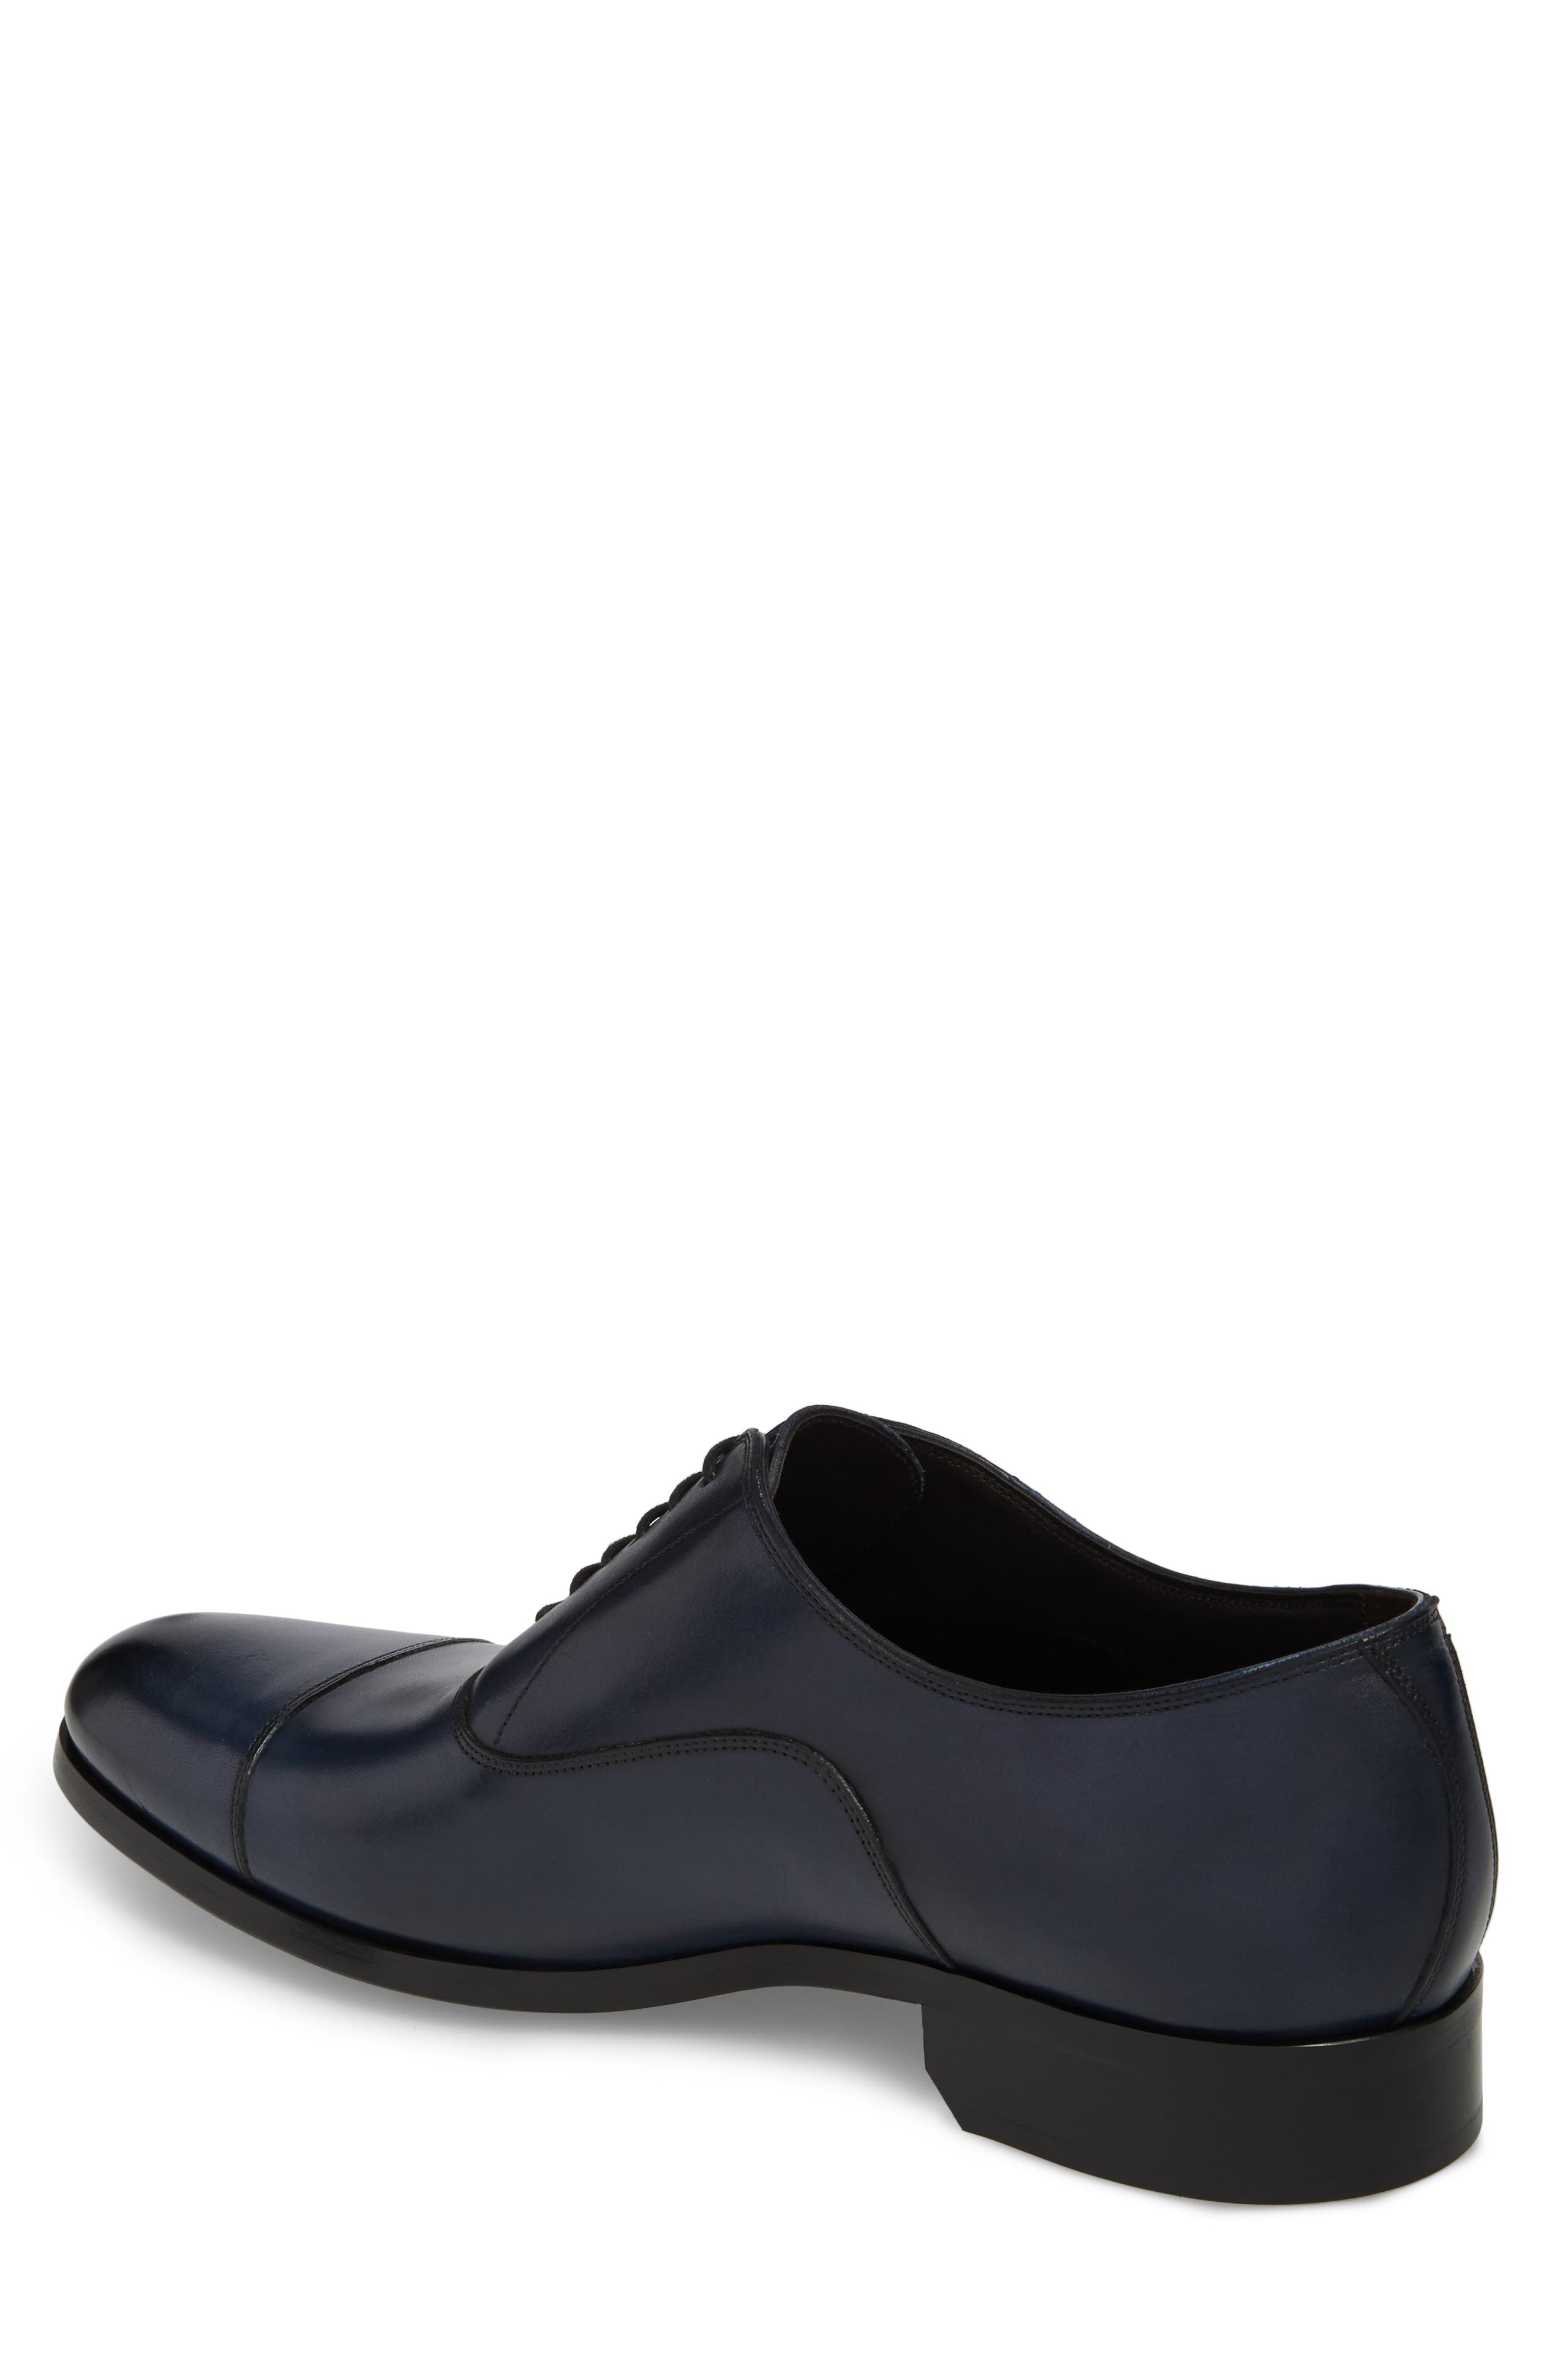 Hartcourt Cap Toe Oxford,                             Alternate thumbnail 2, color,                             Blue Leather